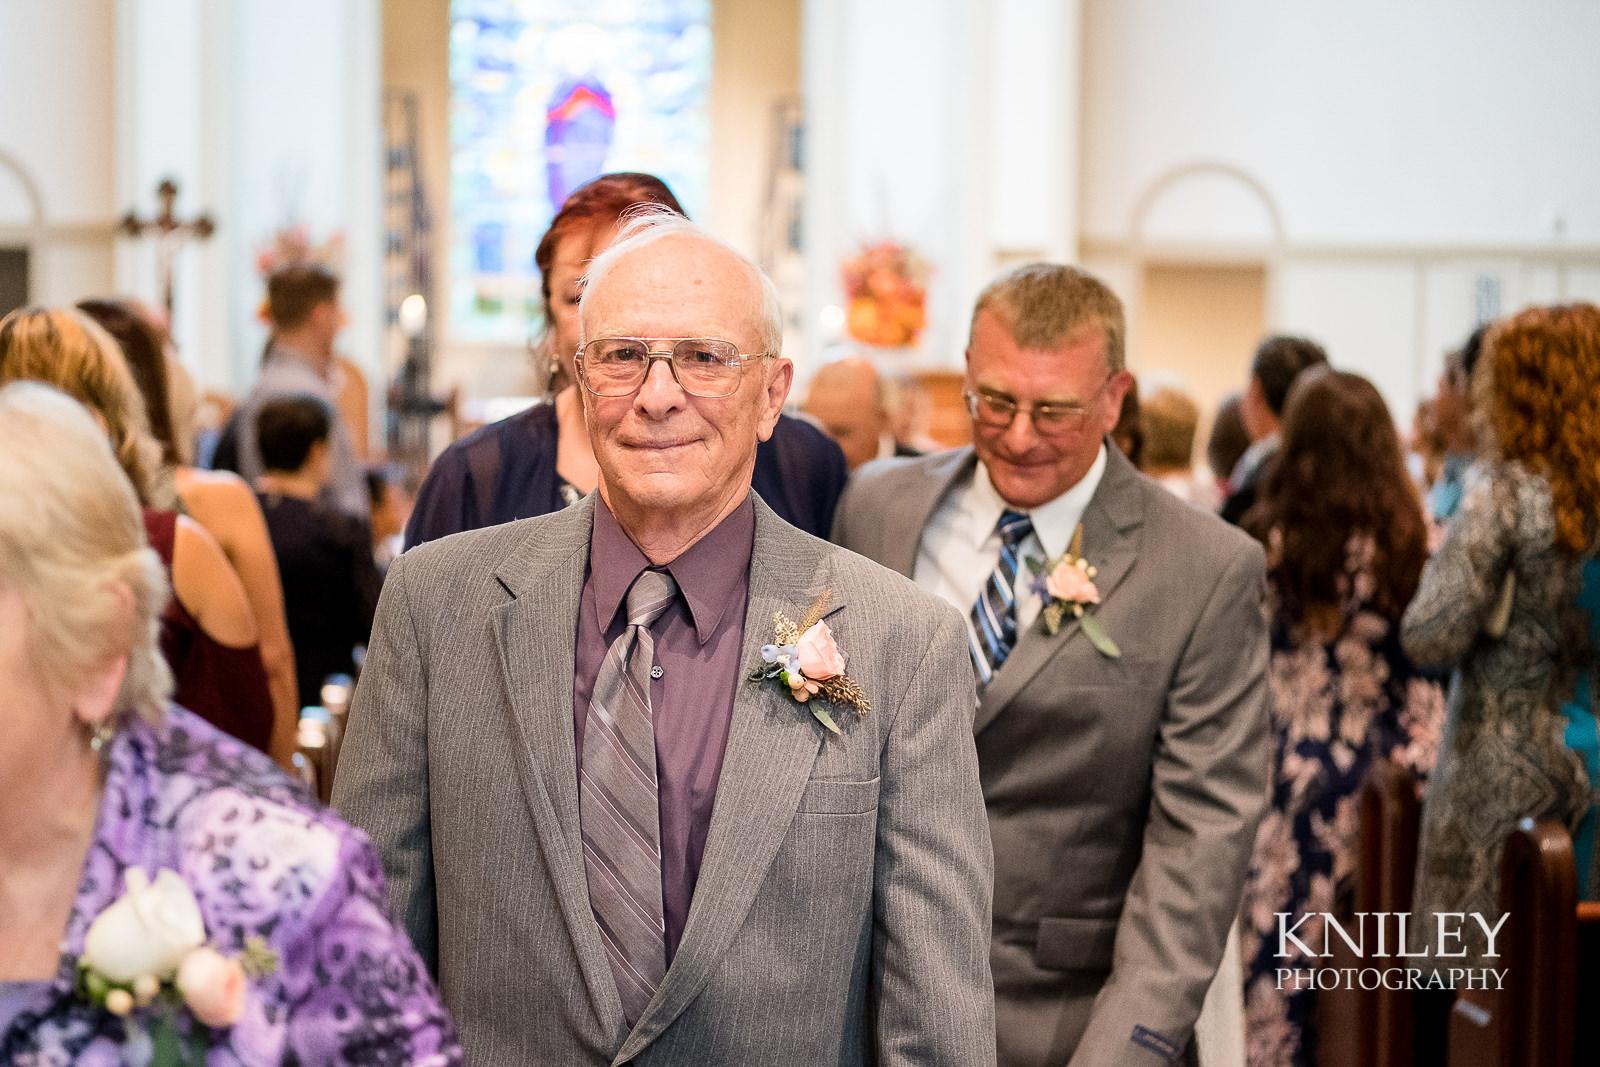 061 - Buffalo NY wedding pictures - St Marys Church - XT2A7025.jpg